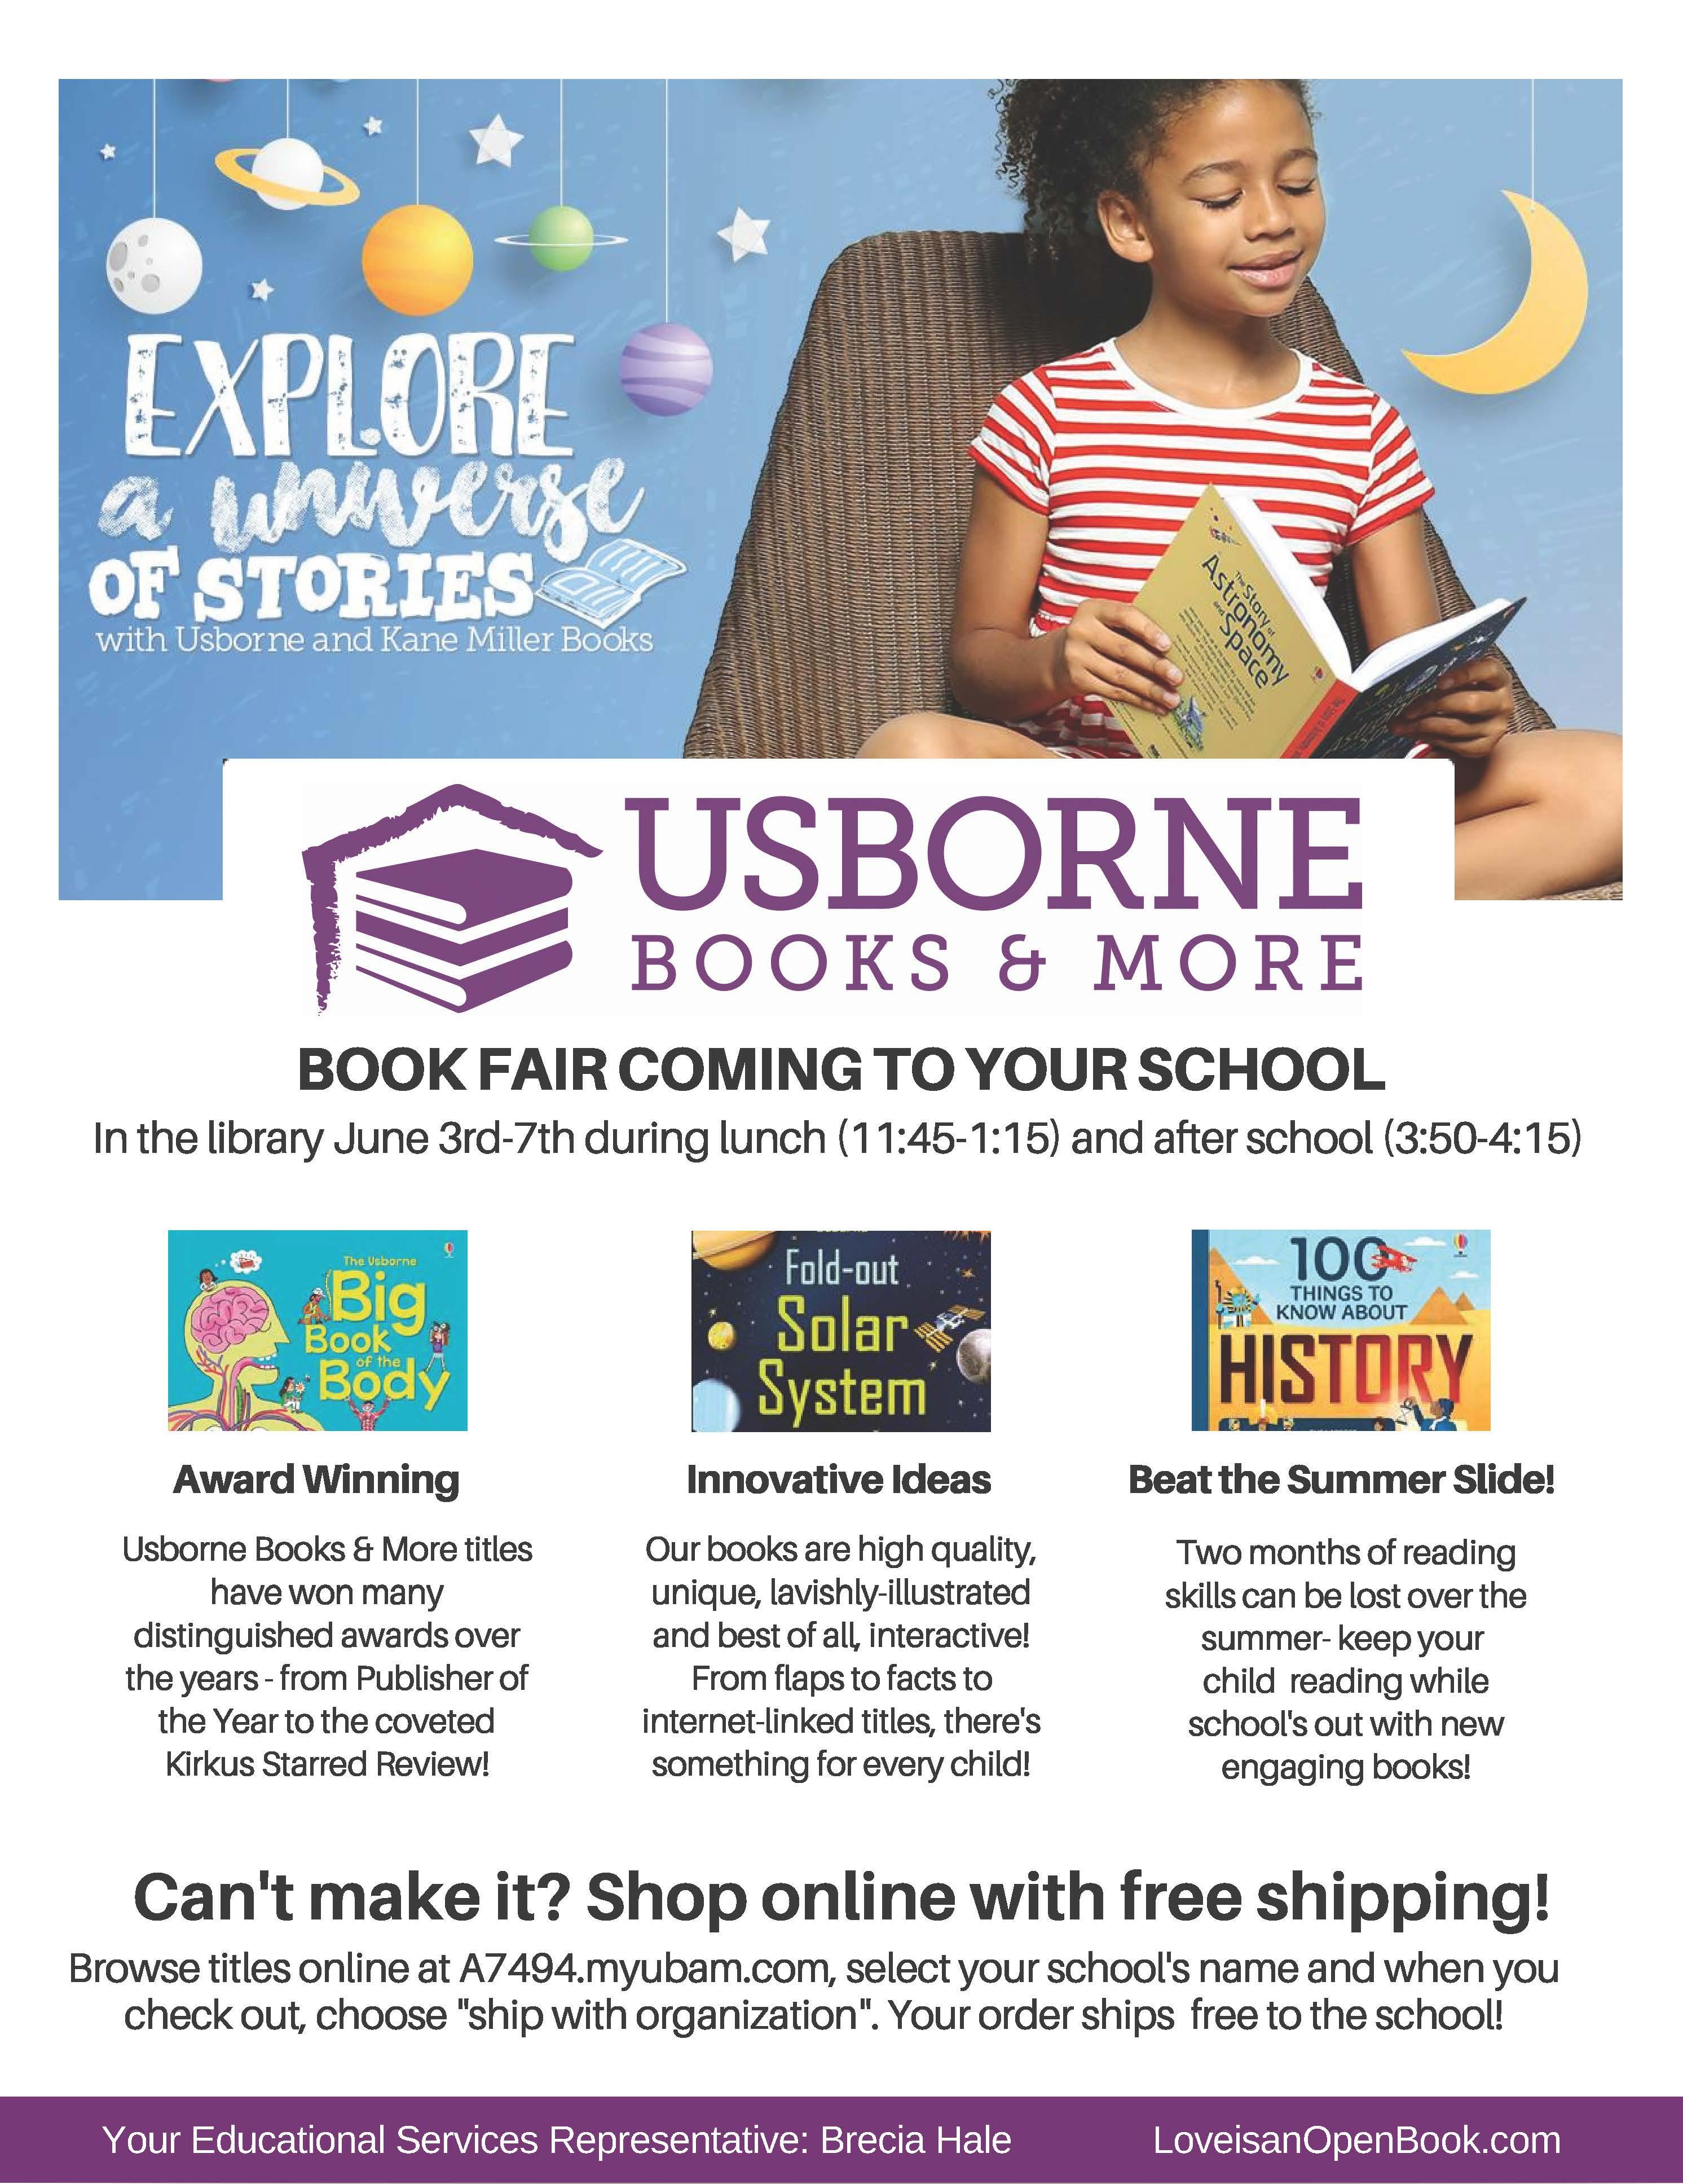 Usborne February 2020 Calendar Book Fair Online Order Information   Sumpter Elementary School